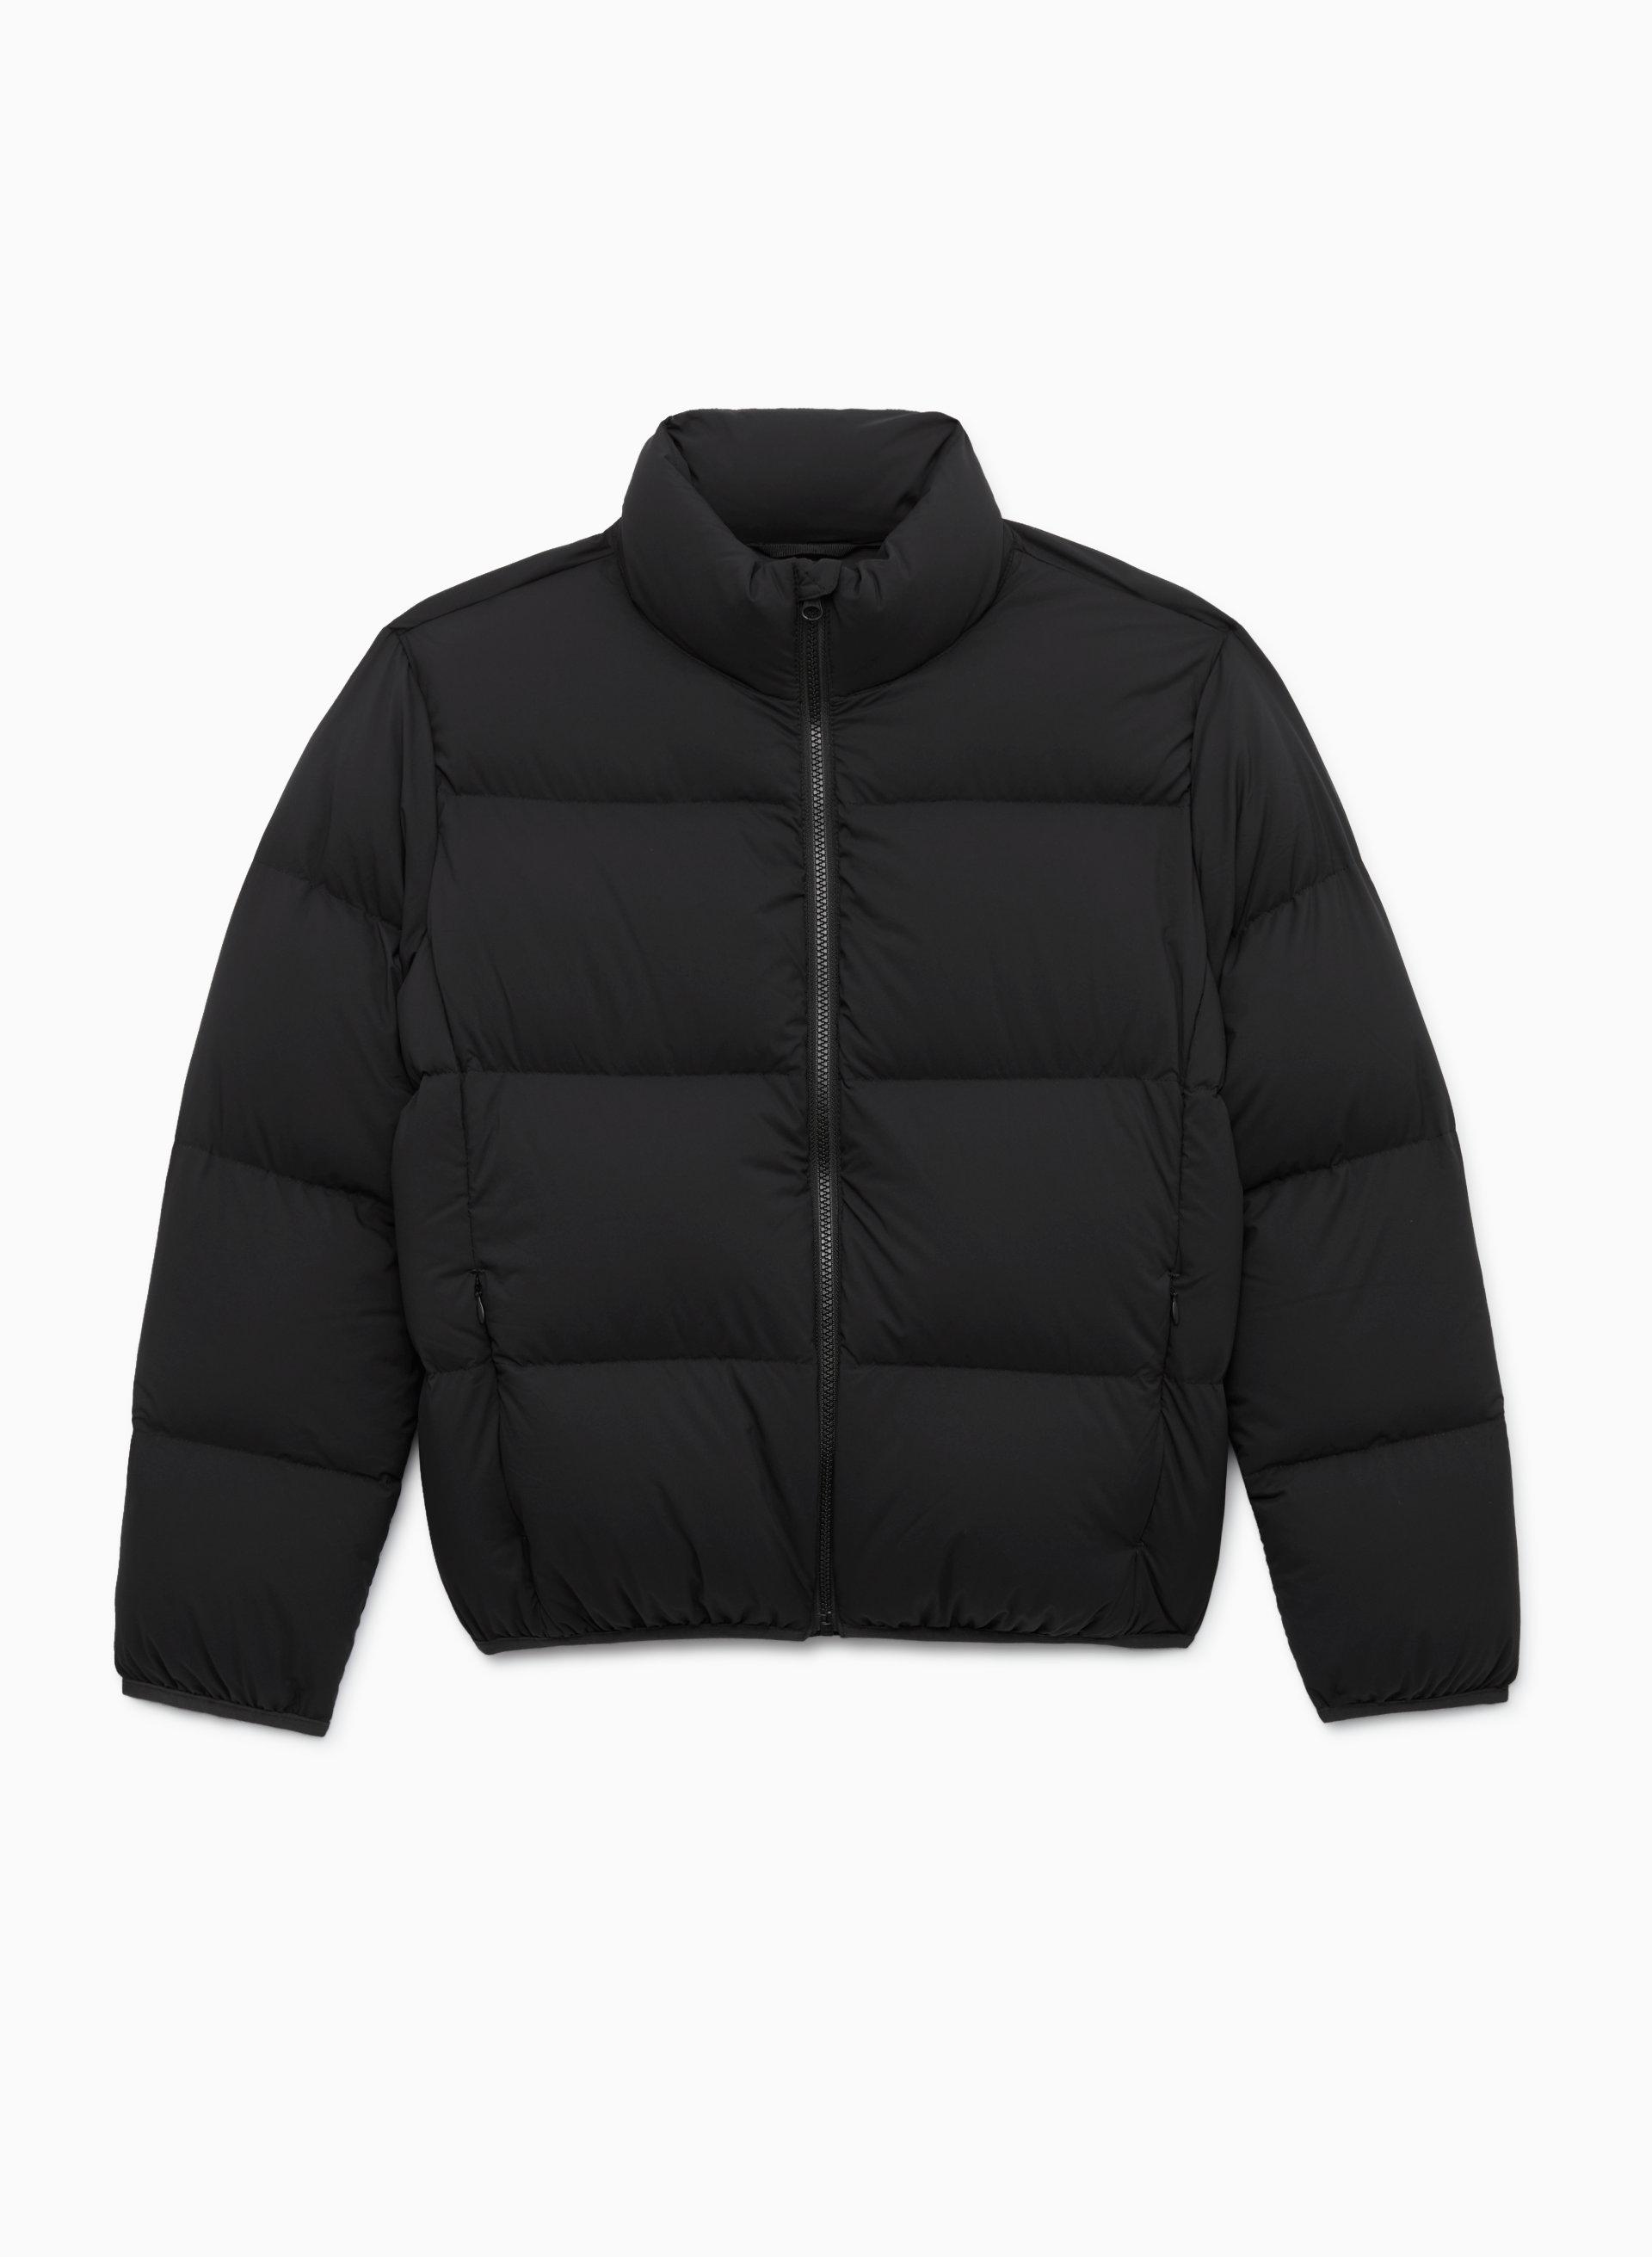 Aritzia Tina Park City Puffer Jacket, Puffer Coat